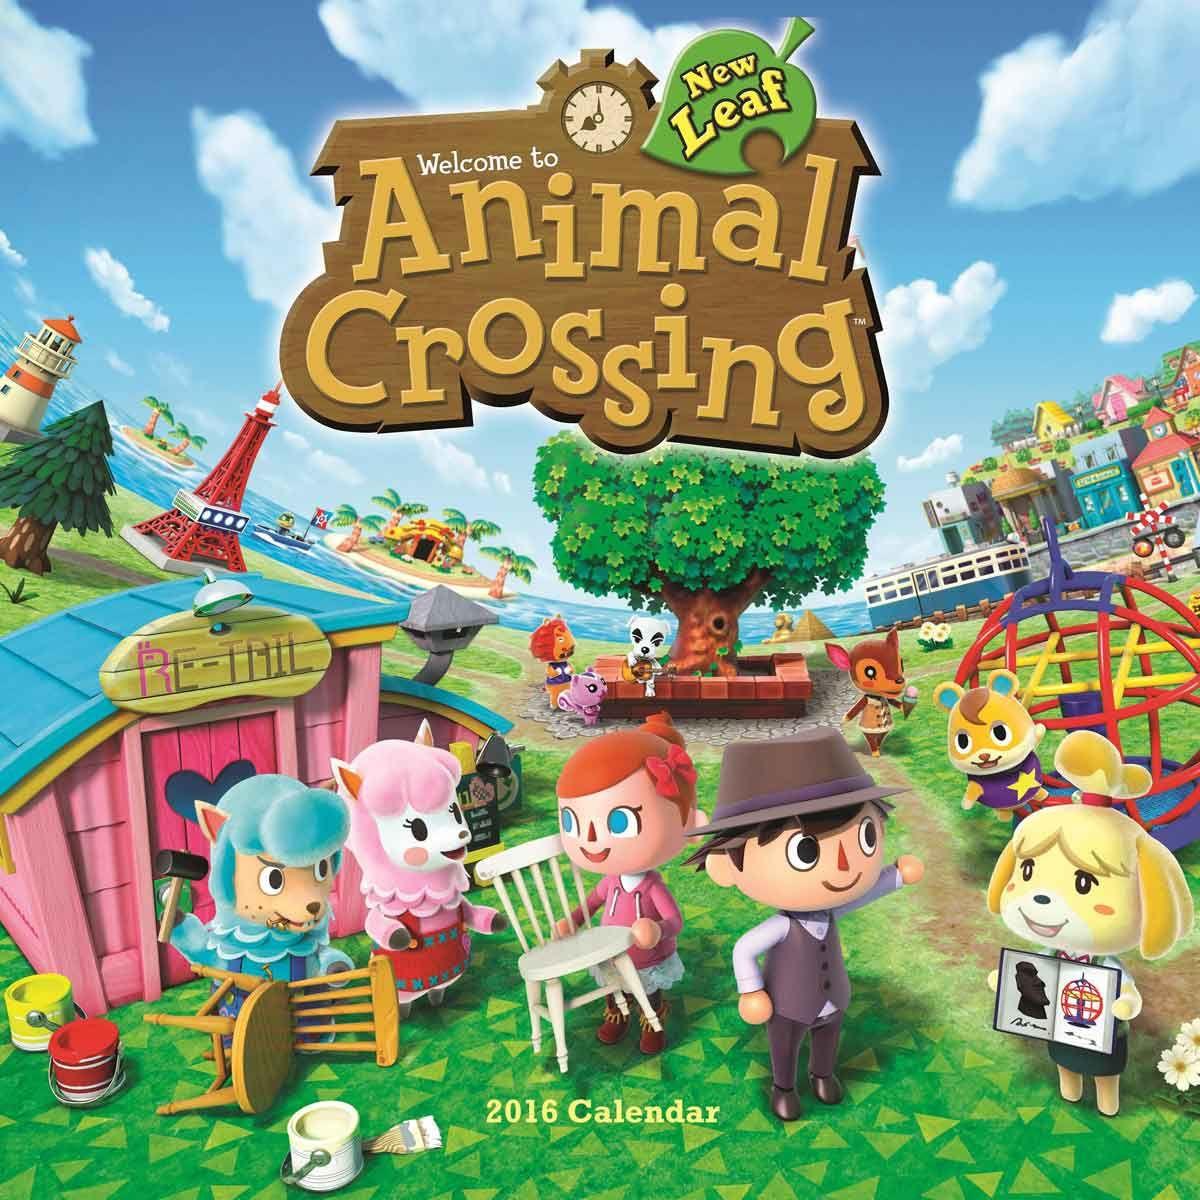 Animal Crossing Calendar 2016 Animal crossing, Animal